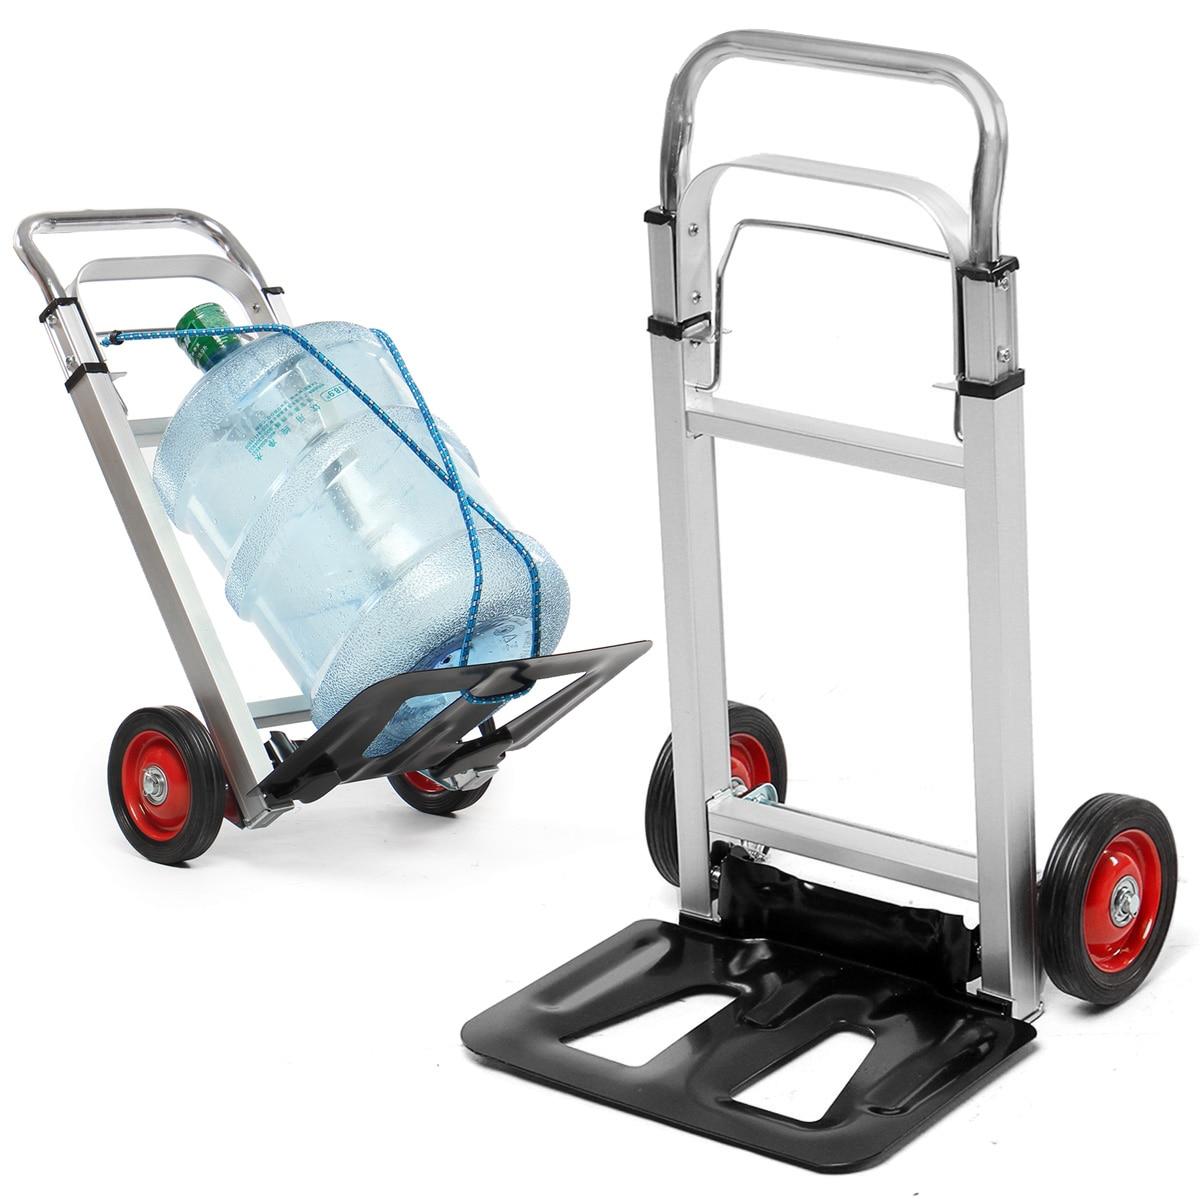 Portable Cart Foldable Trolly Aluminium Hand Truck Trolley Cargo Wheels 90kg Luggage Carts Shopping Wheels